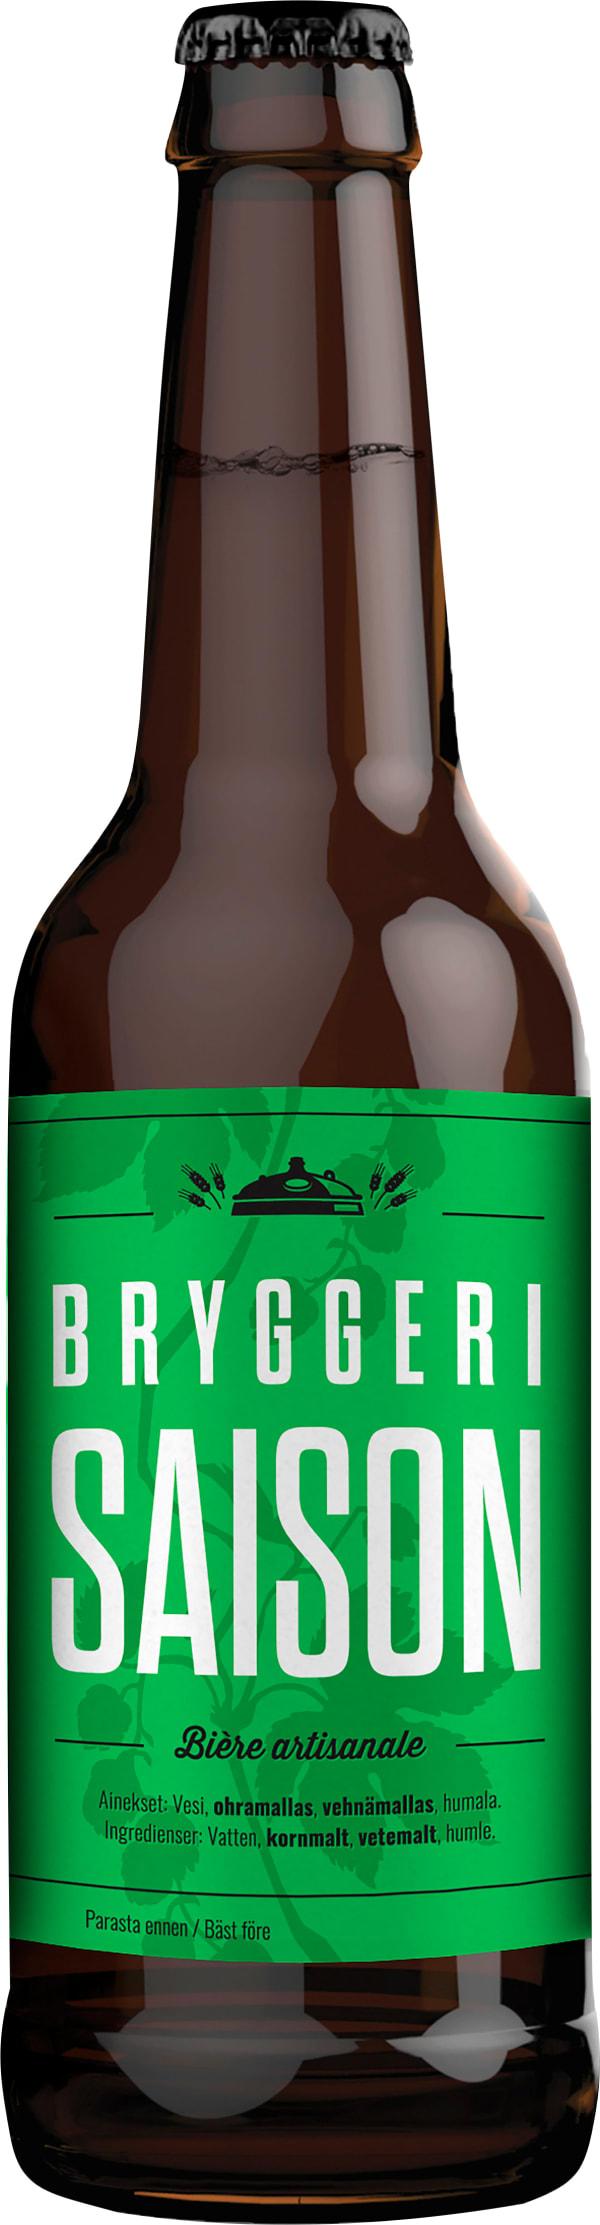 Bryggeri Saison